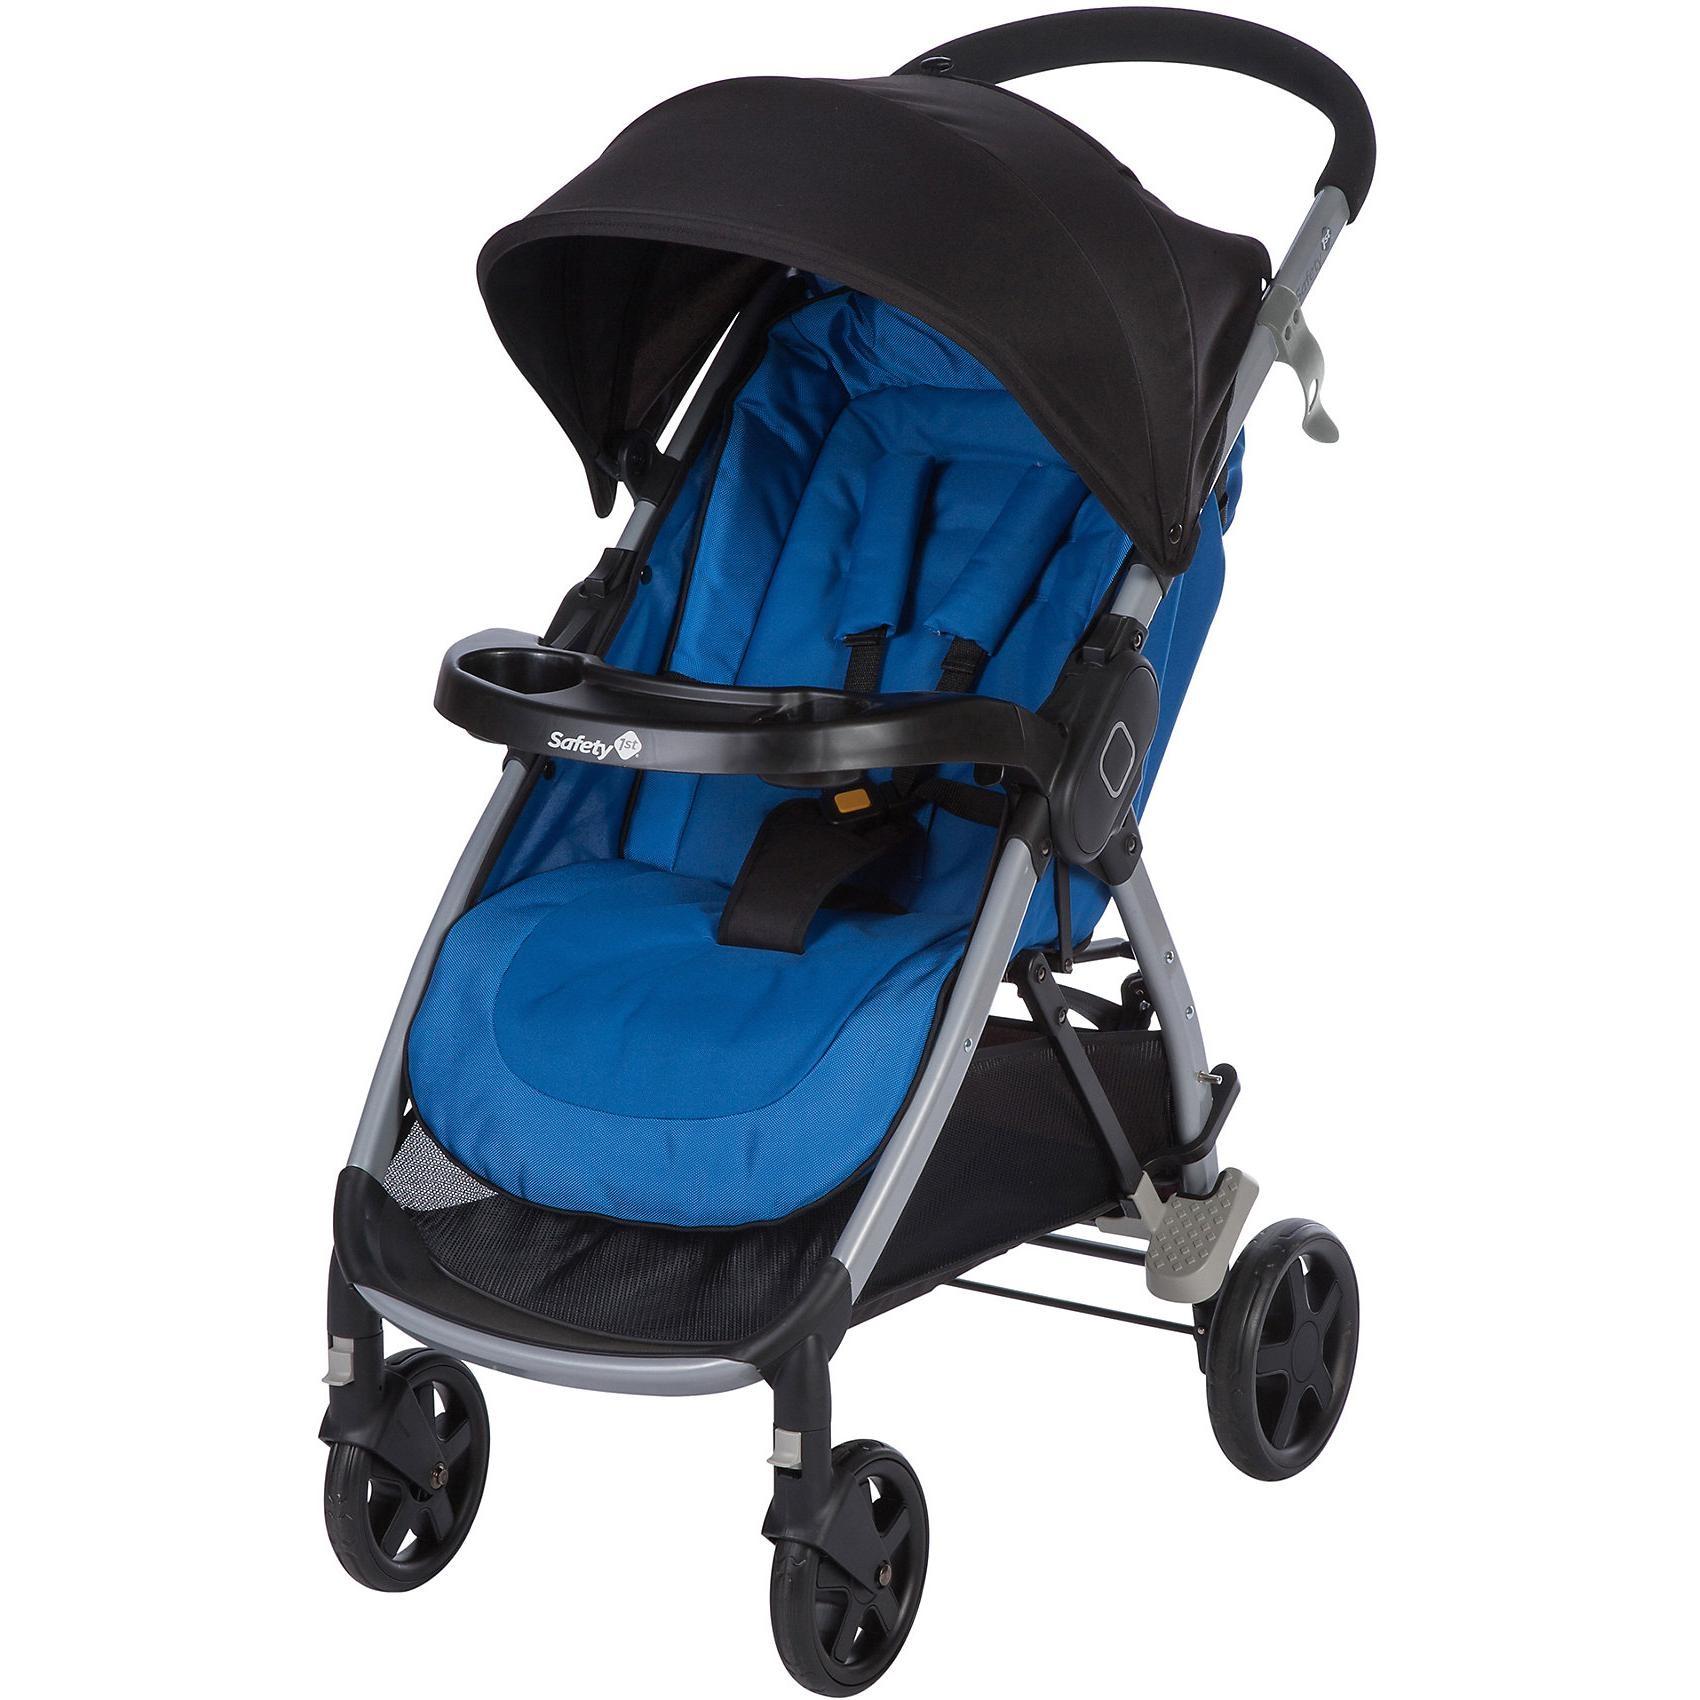 Safety 1st Buggy Step Go Baleine Blue 2018